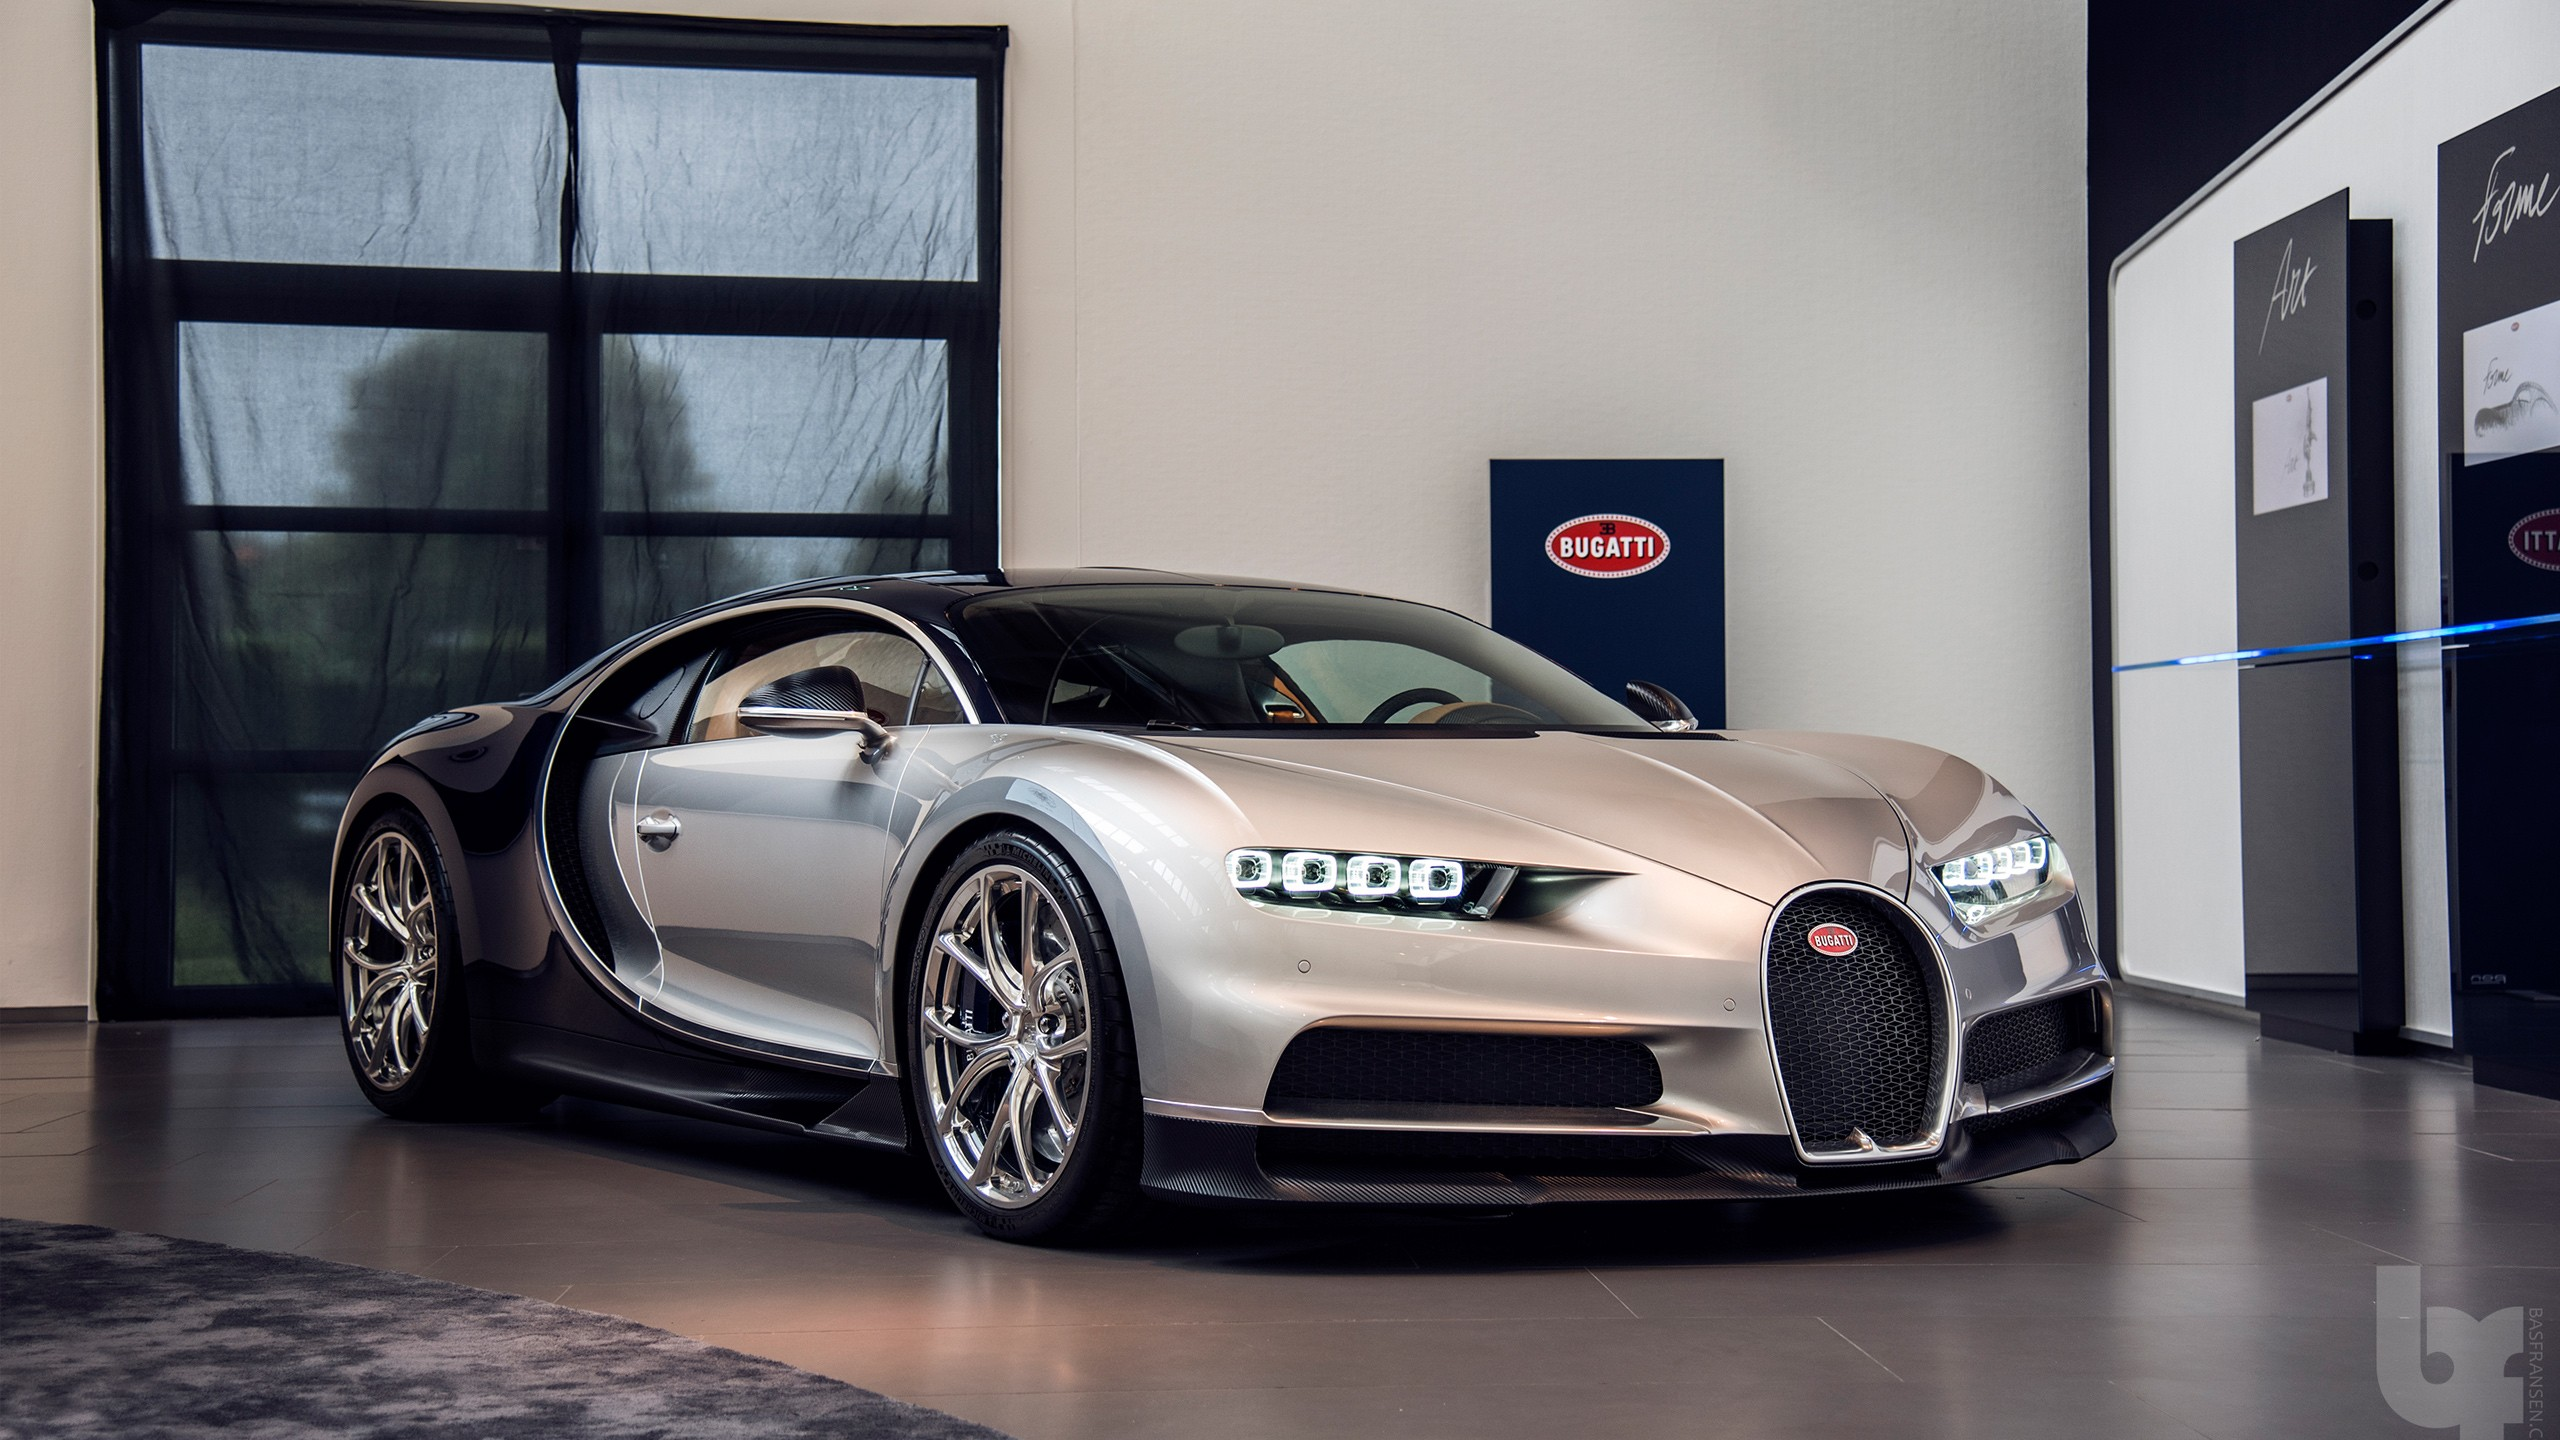 Bugatti Chiron Most Expensive Car Wallpaper Hd Car Wallpapers Id 6949